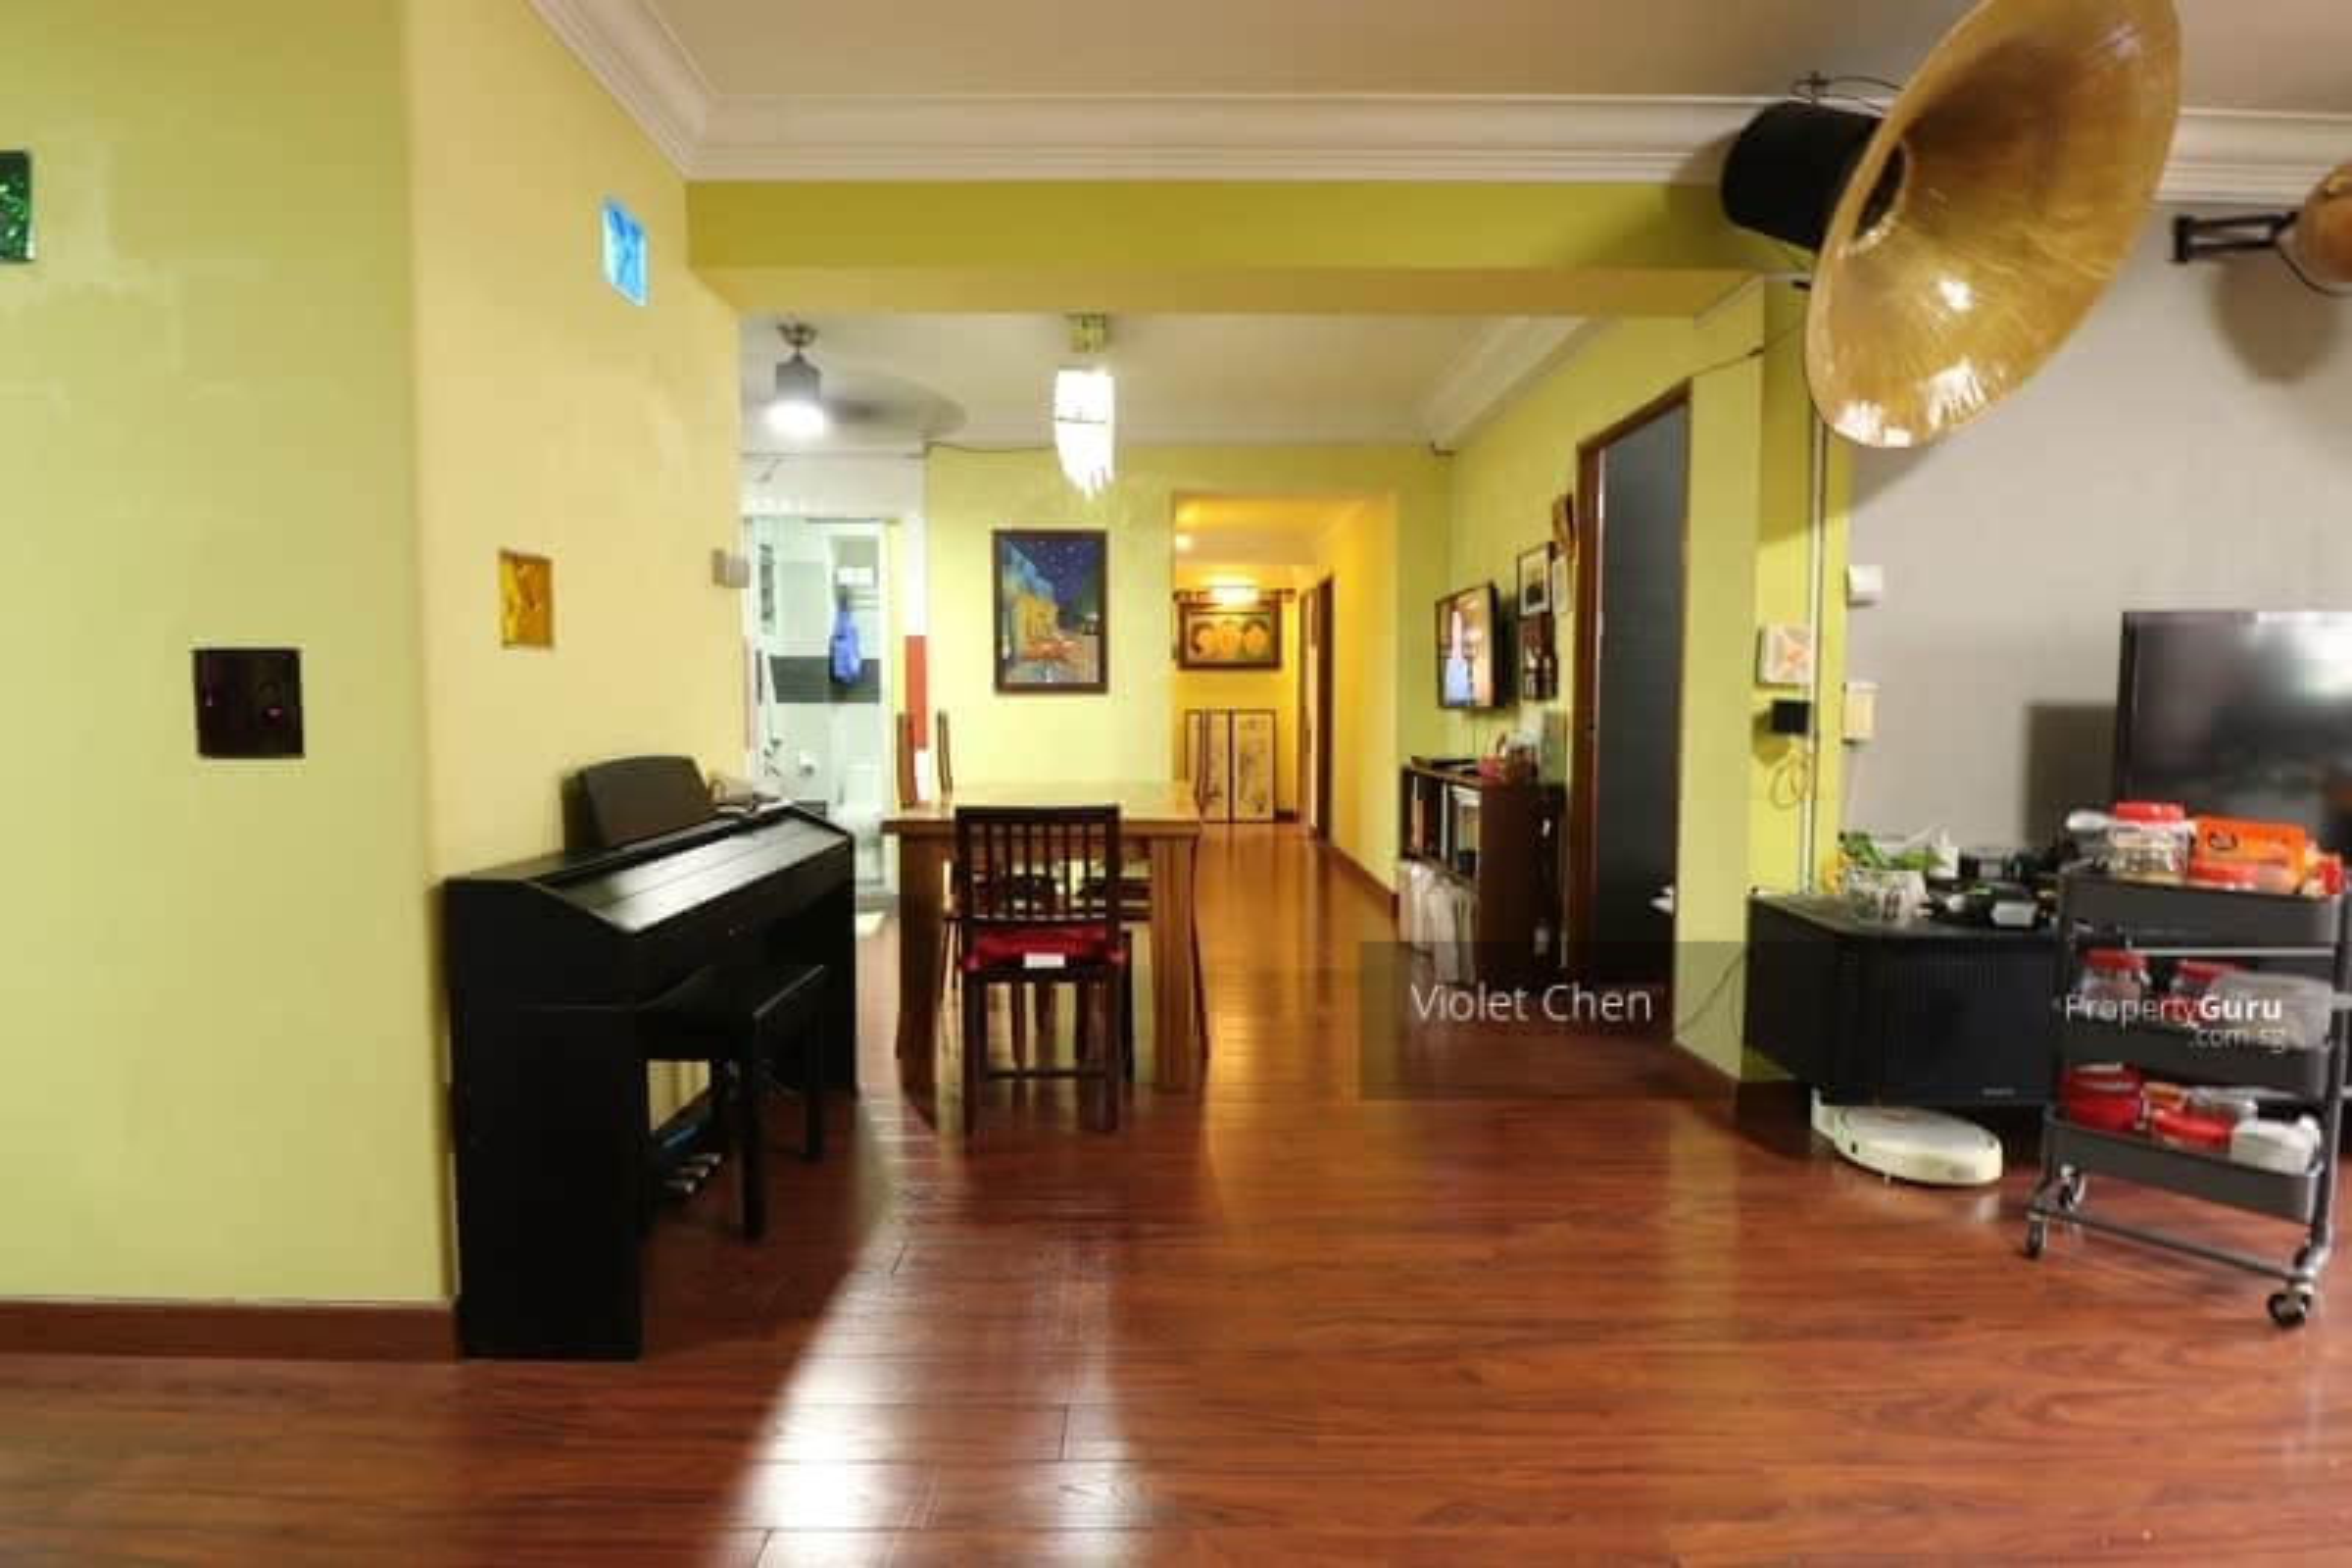 29 Chai Chee Avenue #128635322